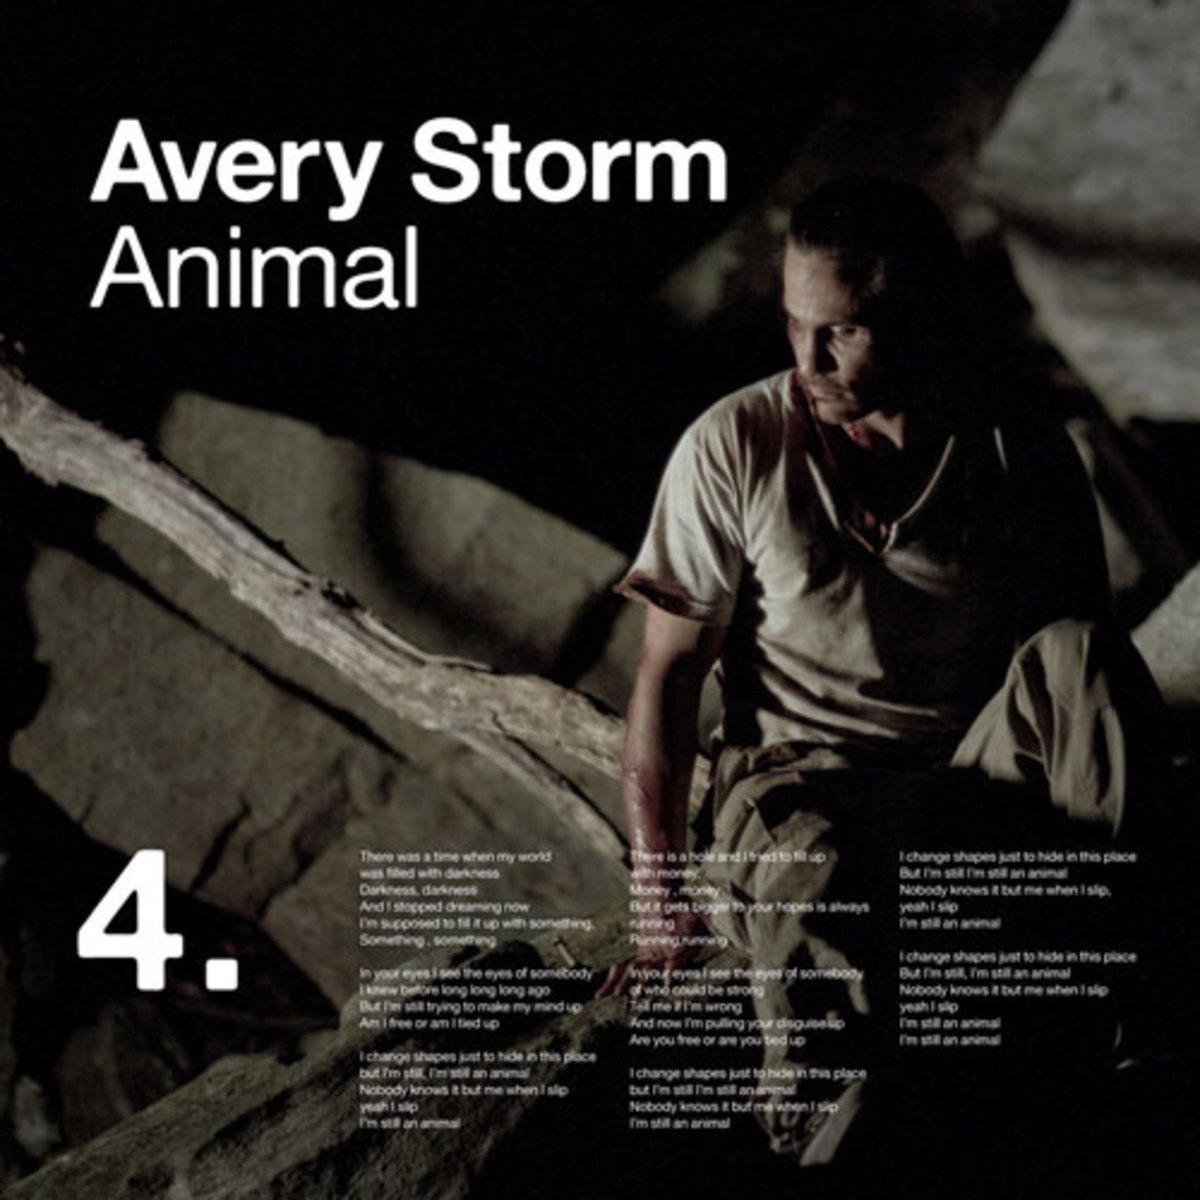 averystorm-animal.jpg